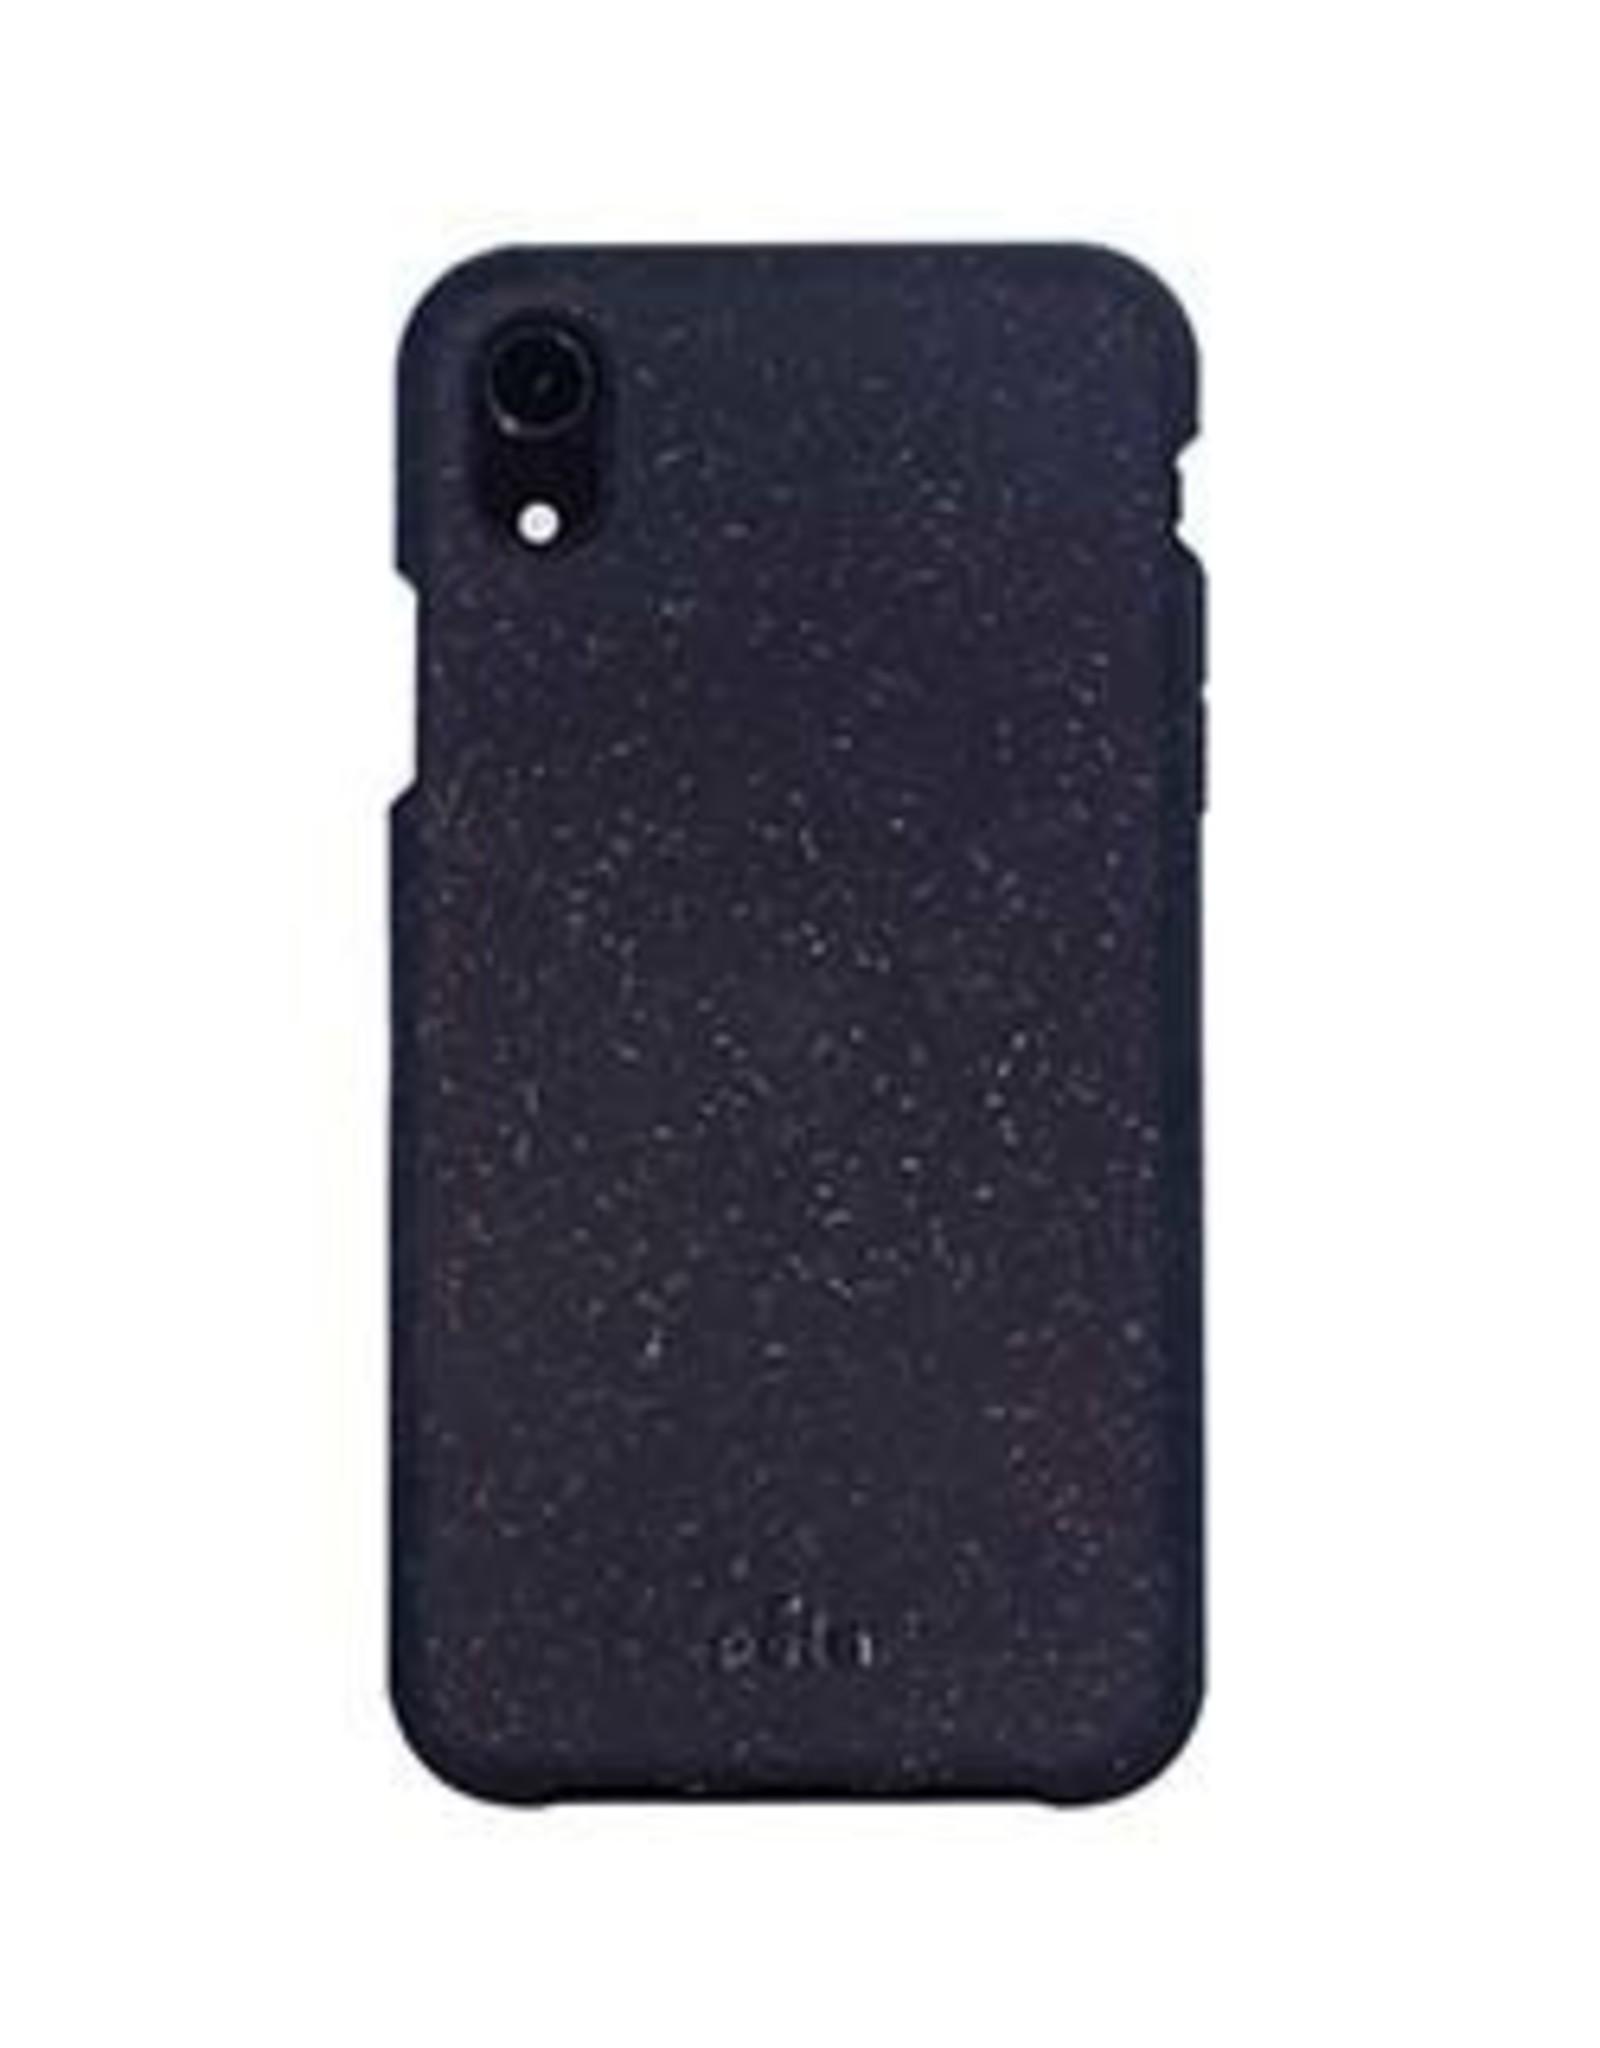 Pela Pela | iPhone XR Black Compostable Eco-Friendly Protective Case 15-04711